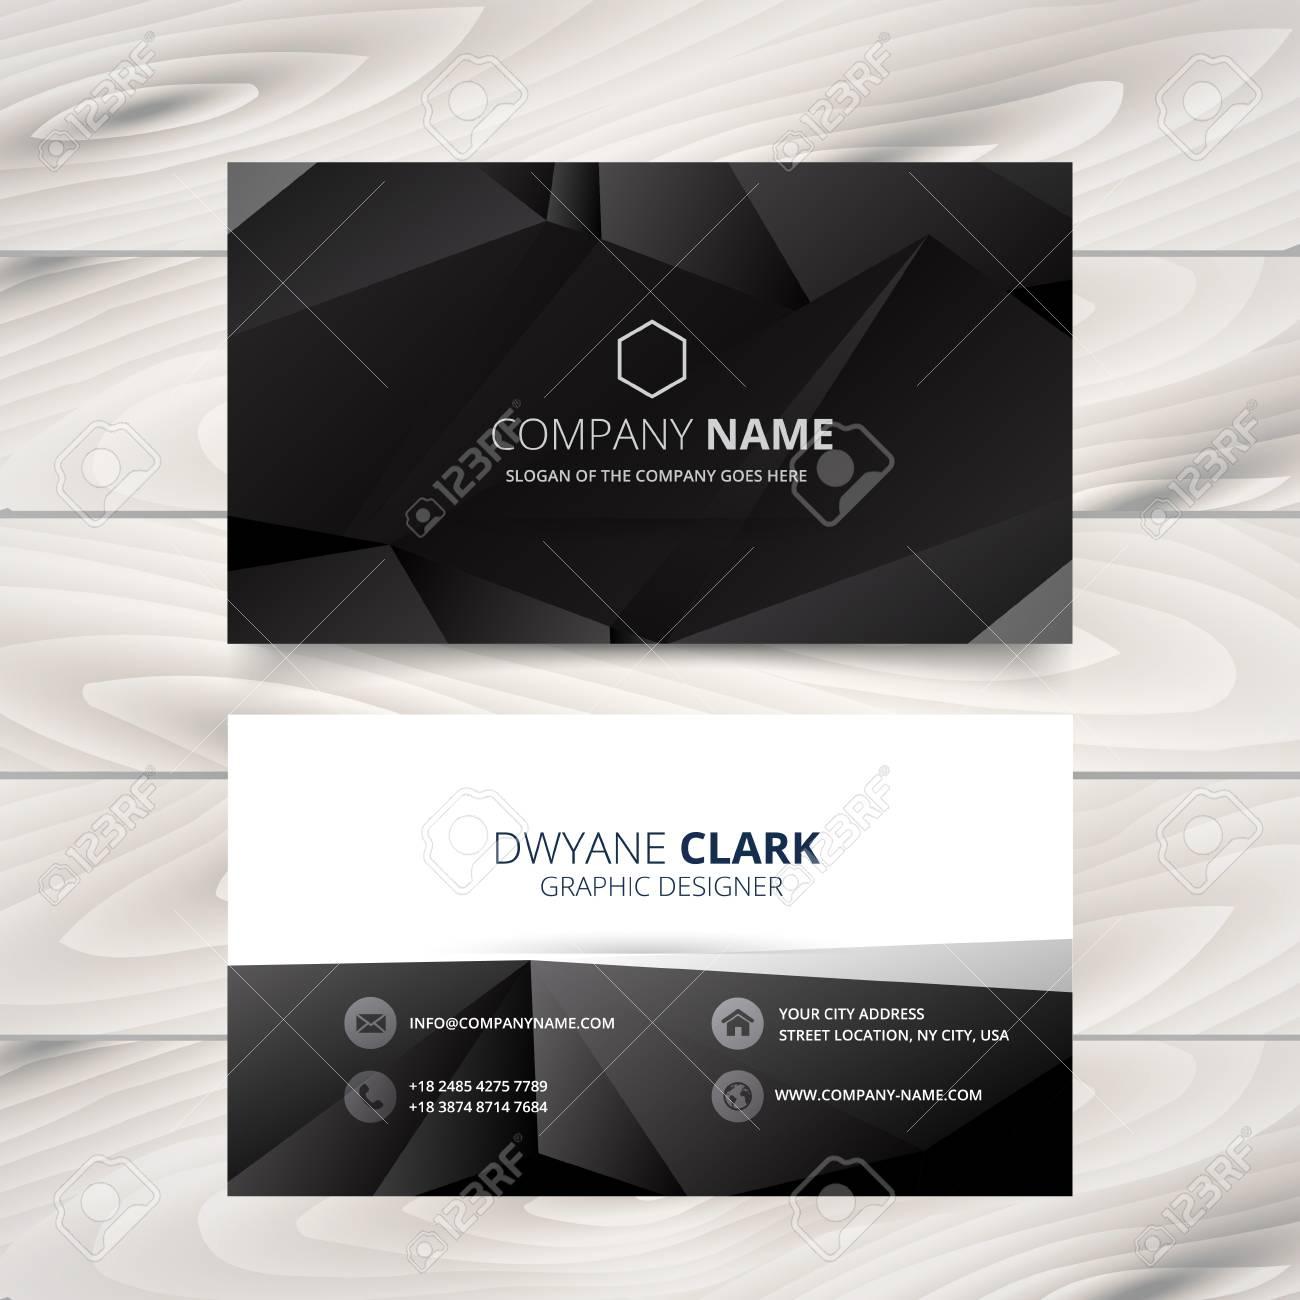 Dark Modern Business Card Design Illustration Royalty Free Cliparts ...